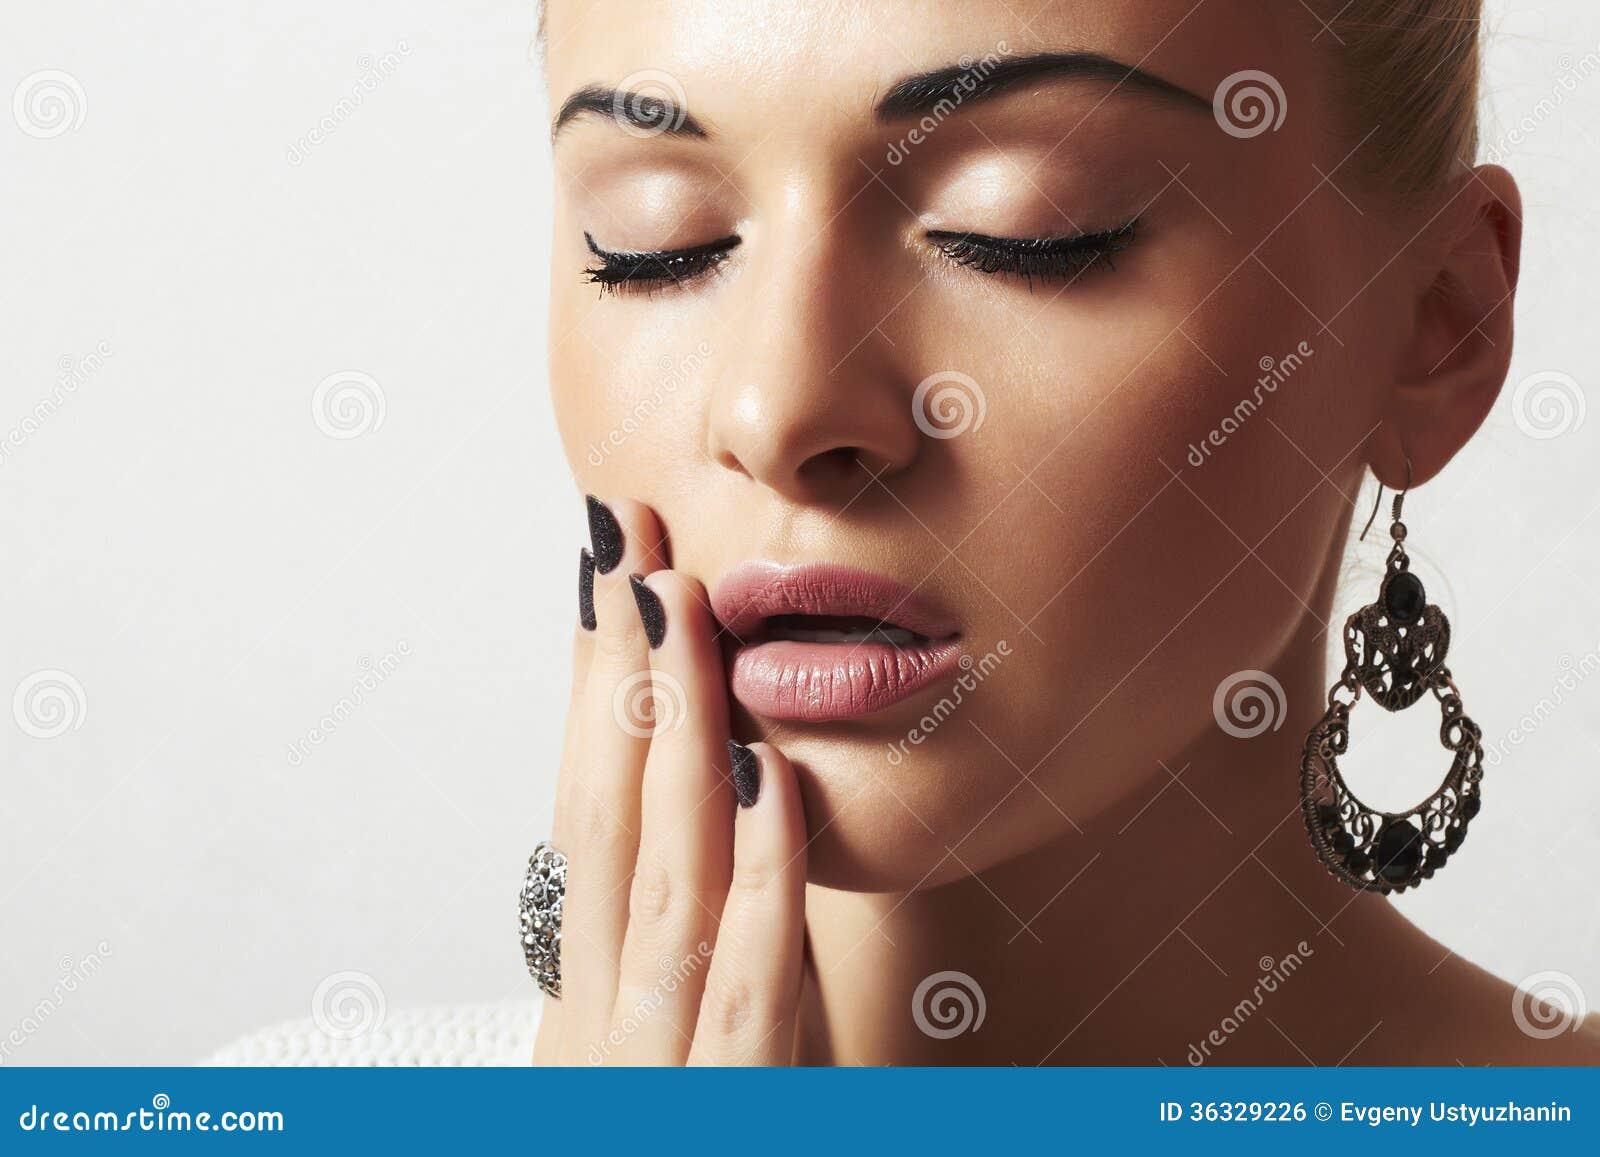 Piękna kobieta. Biżuteria i Beauty.girl.ornamentation.liquid piasek manicure.hairless